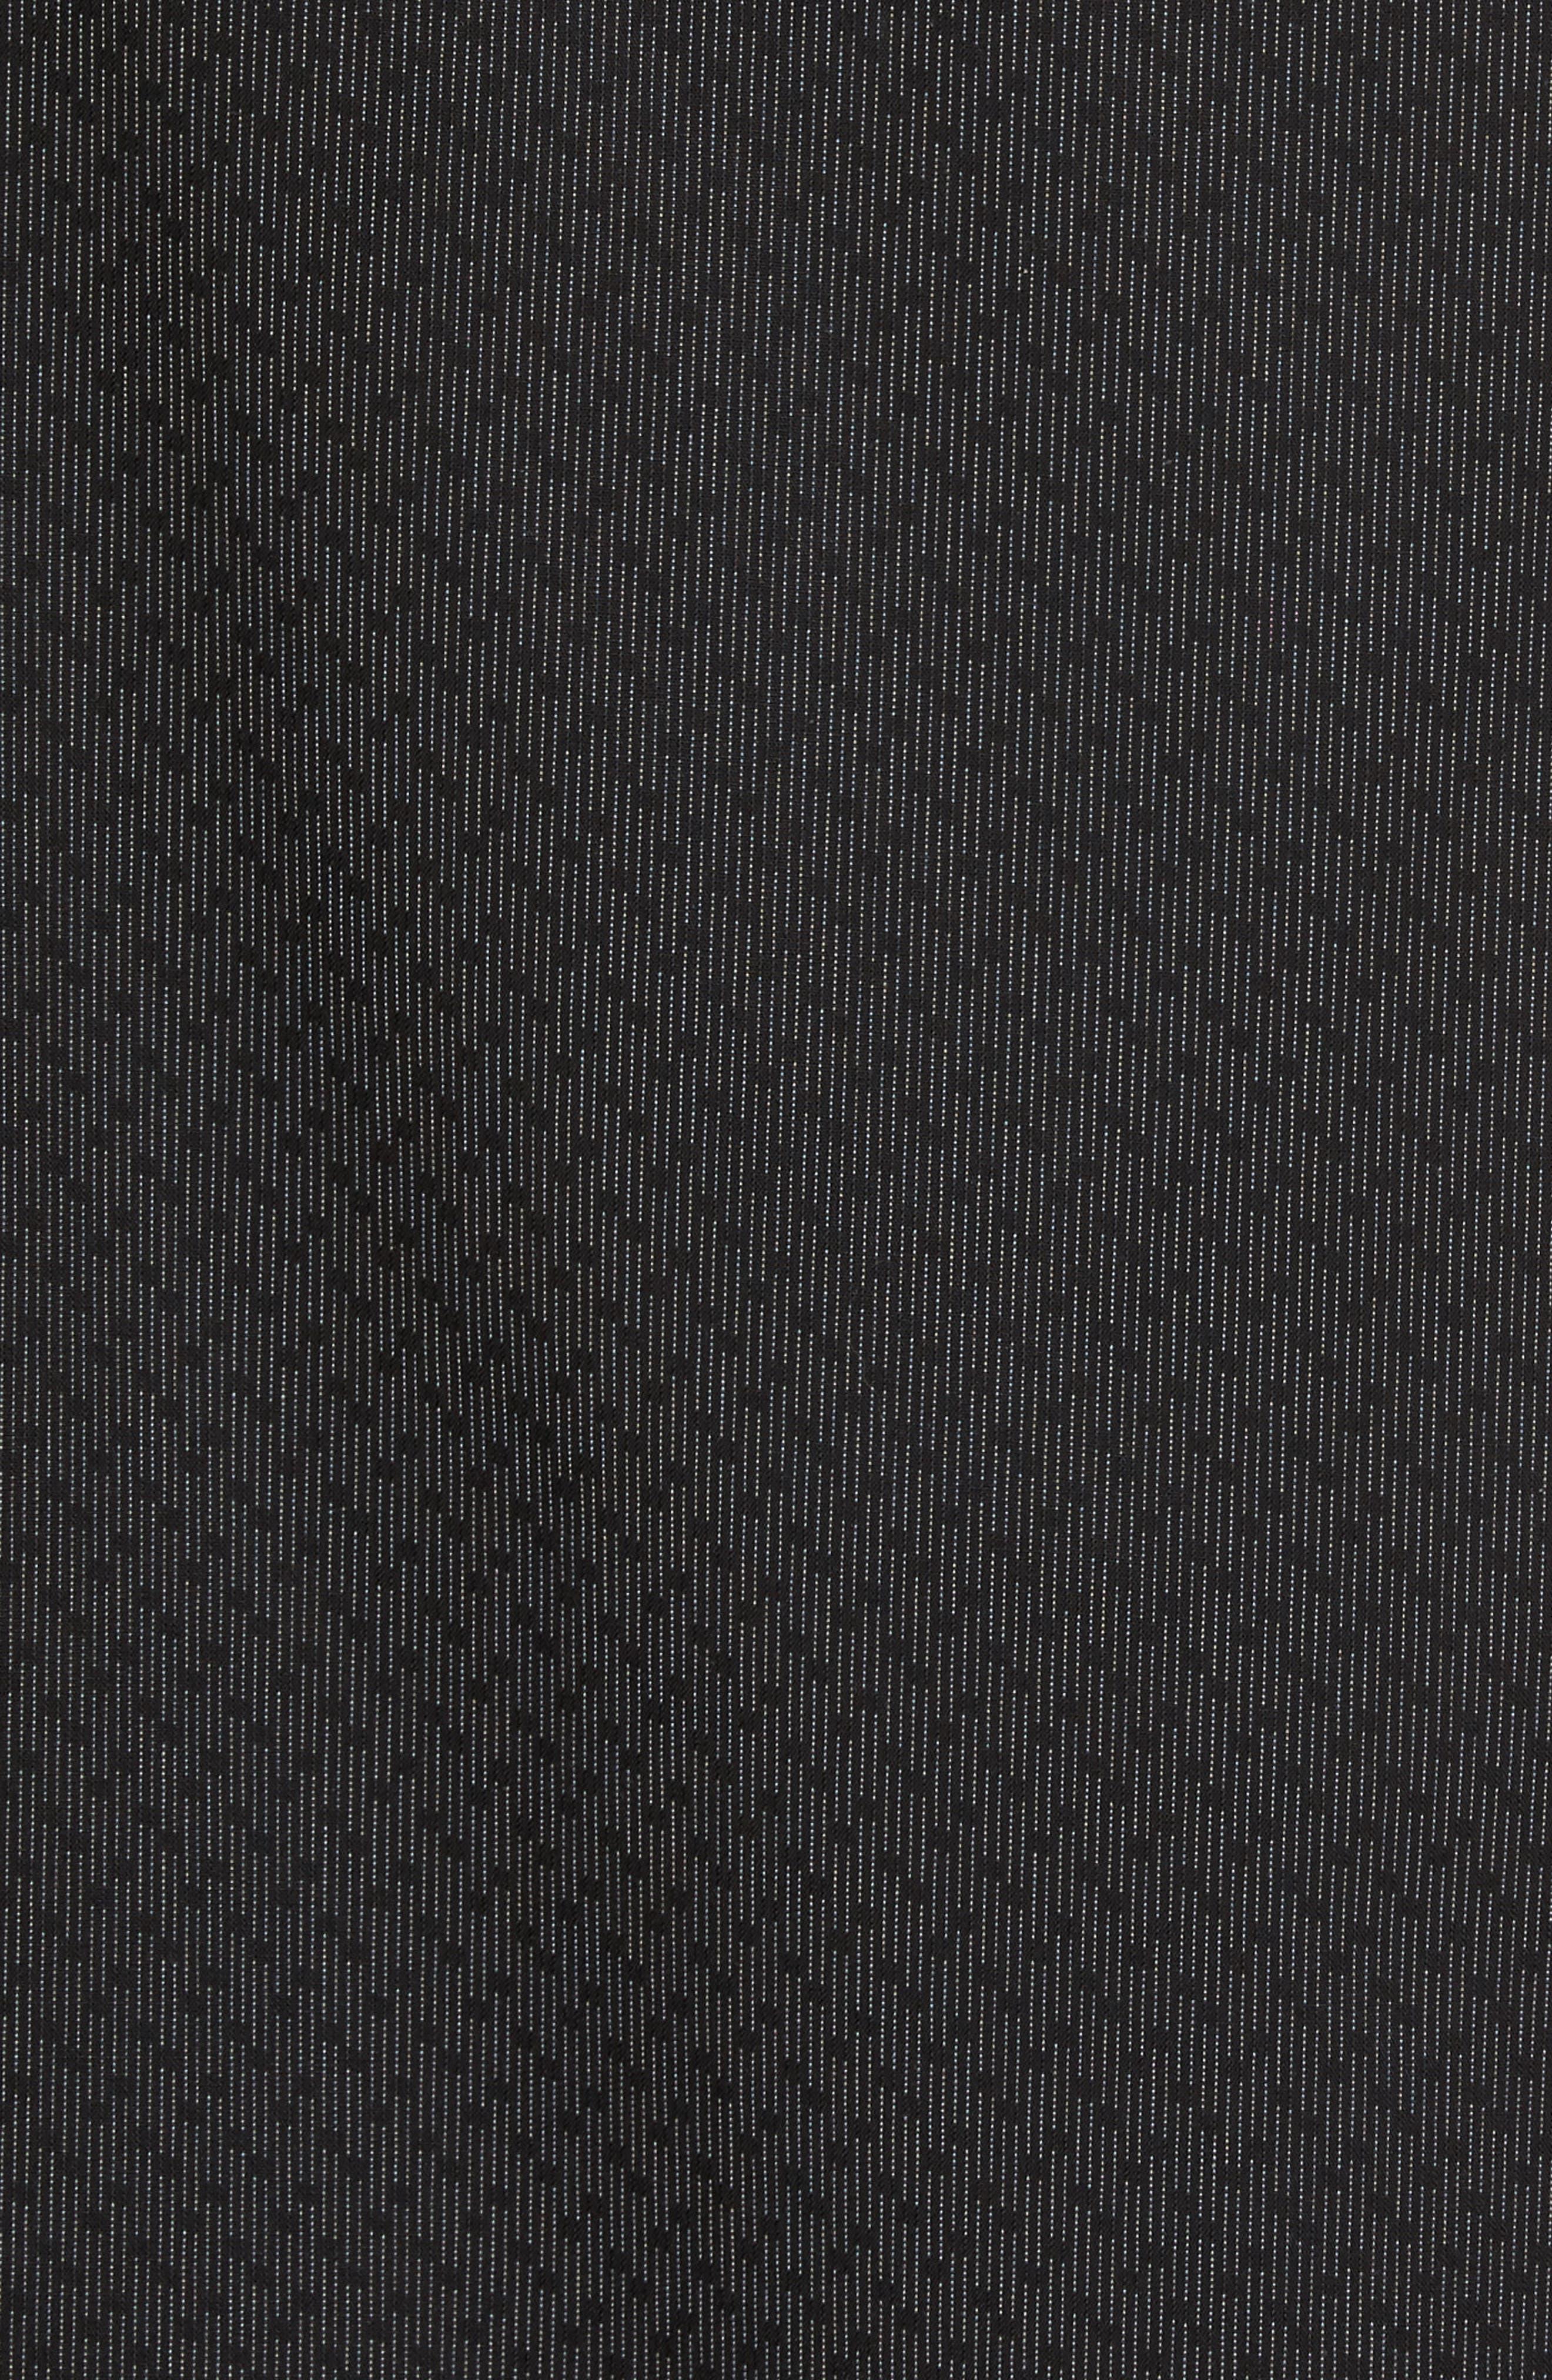 Trim Fit Print Sport Shirt,                             Alternate thumbnail 5, color,                             Black Caviar Dot Dobby